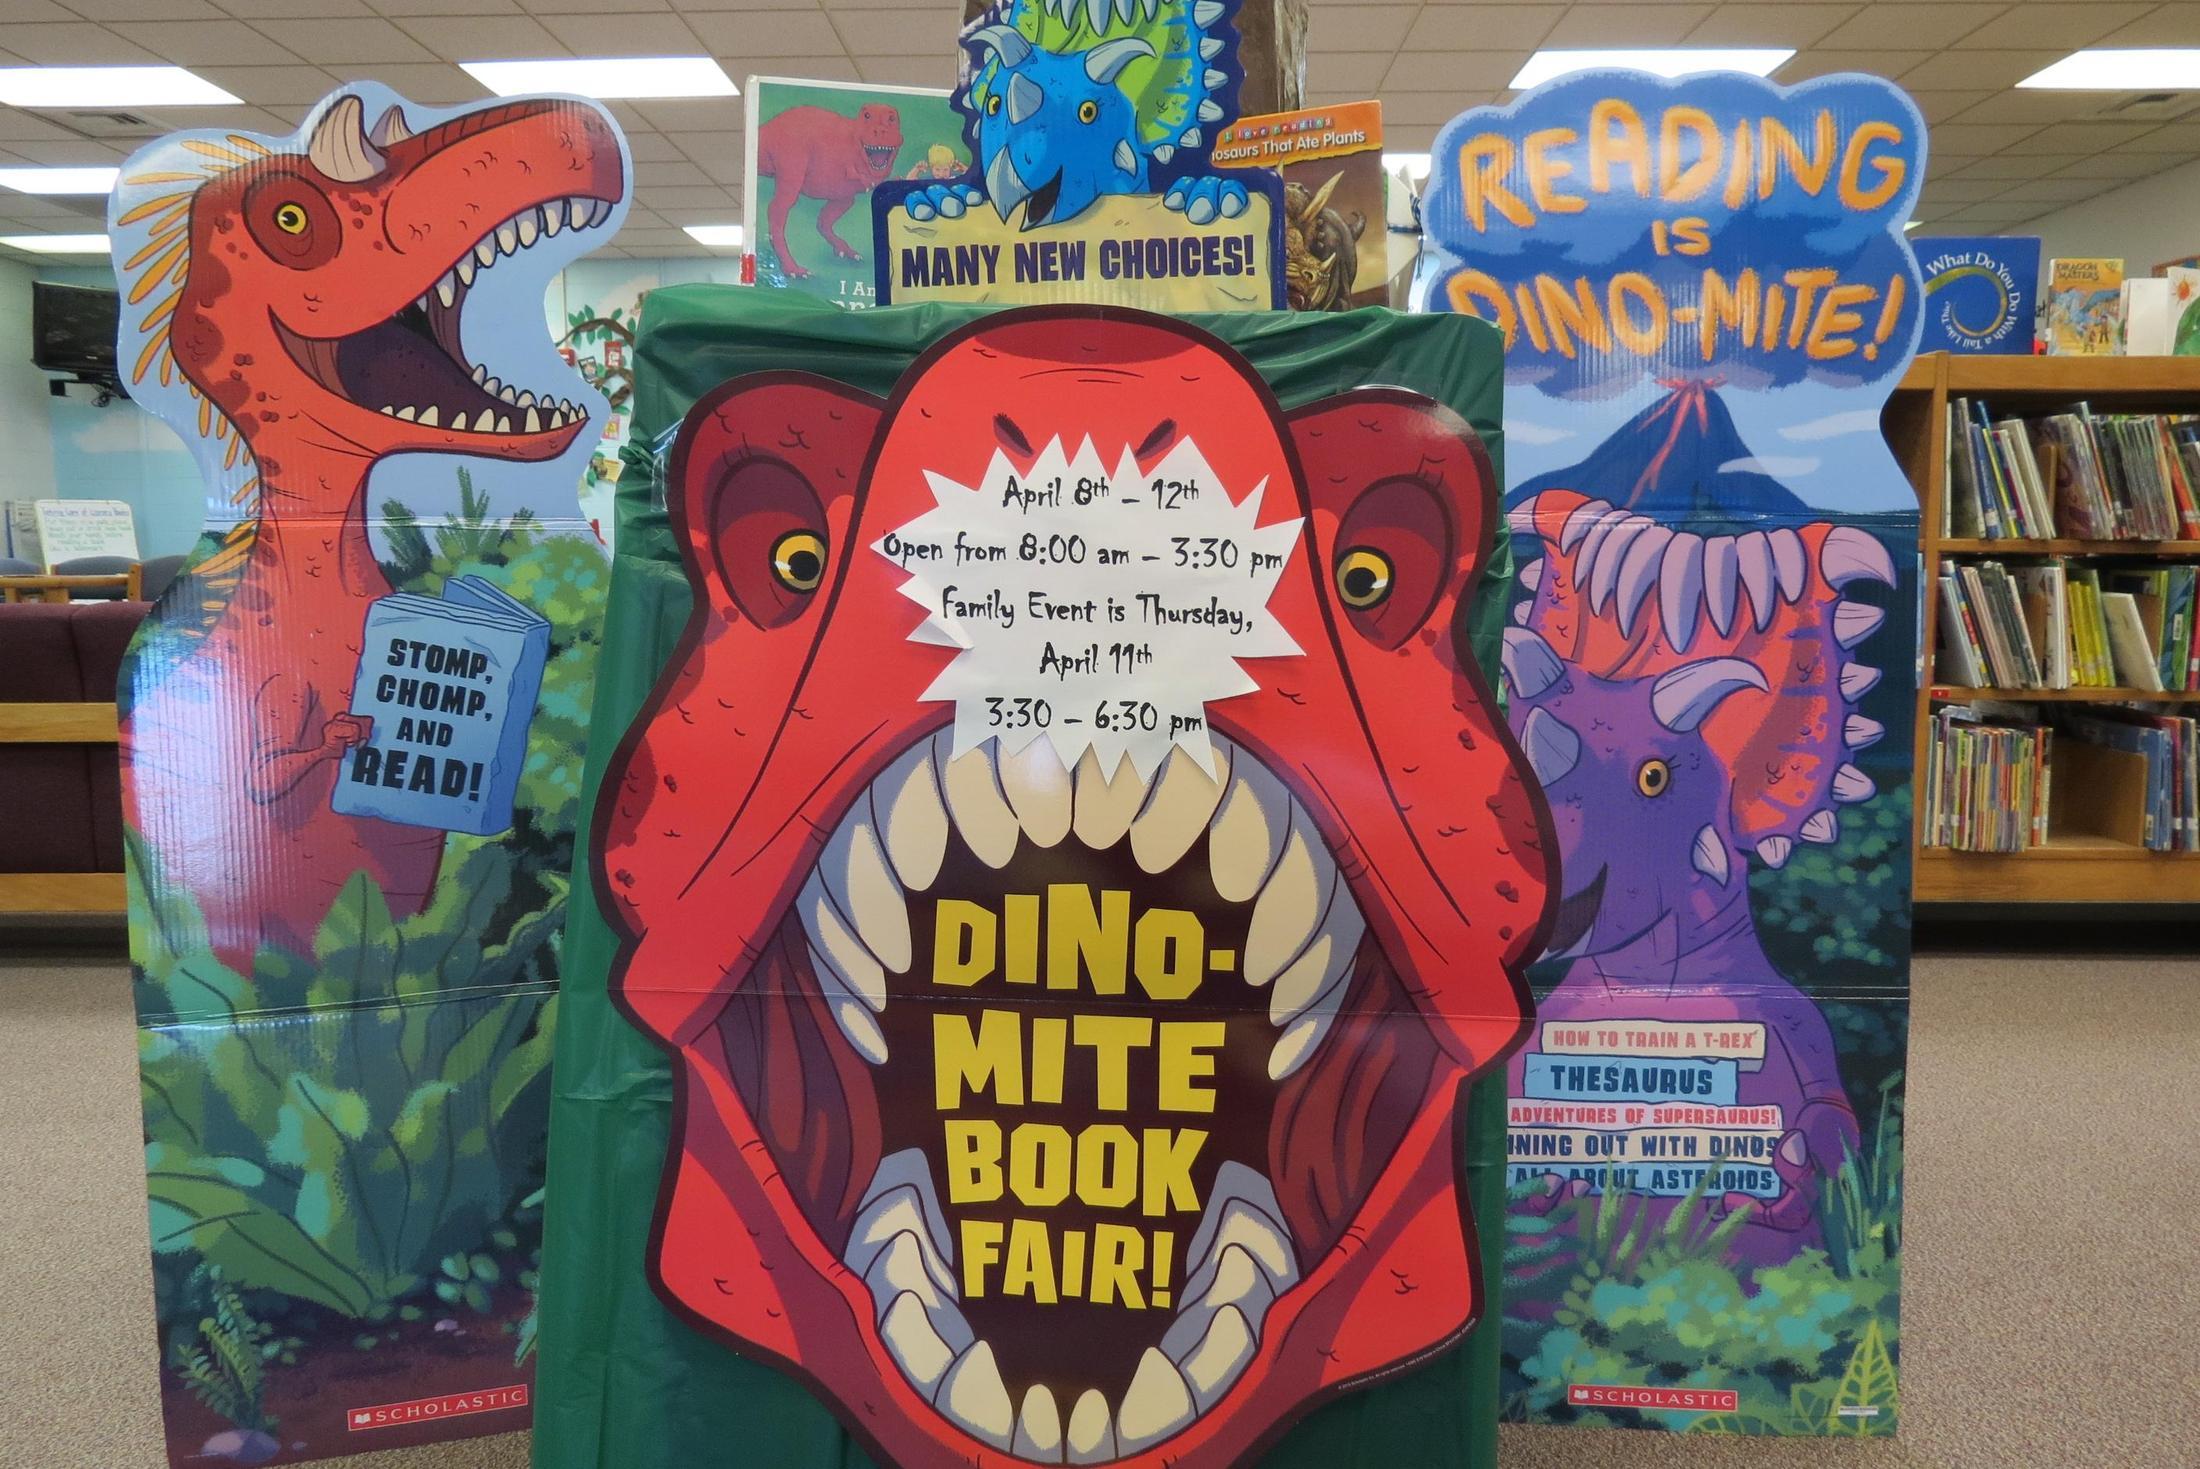 scholastic book fair 2019 preview